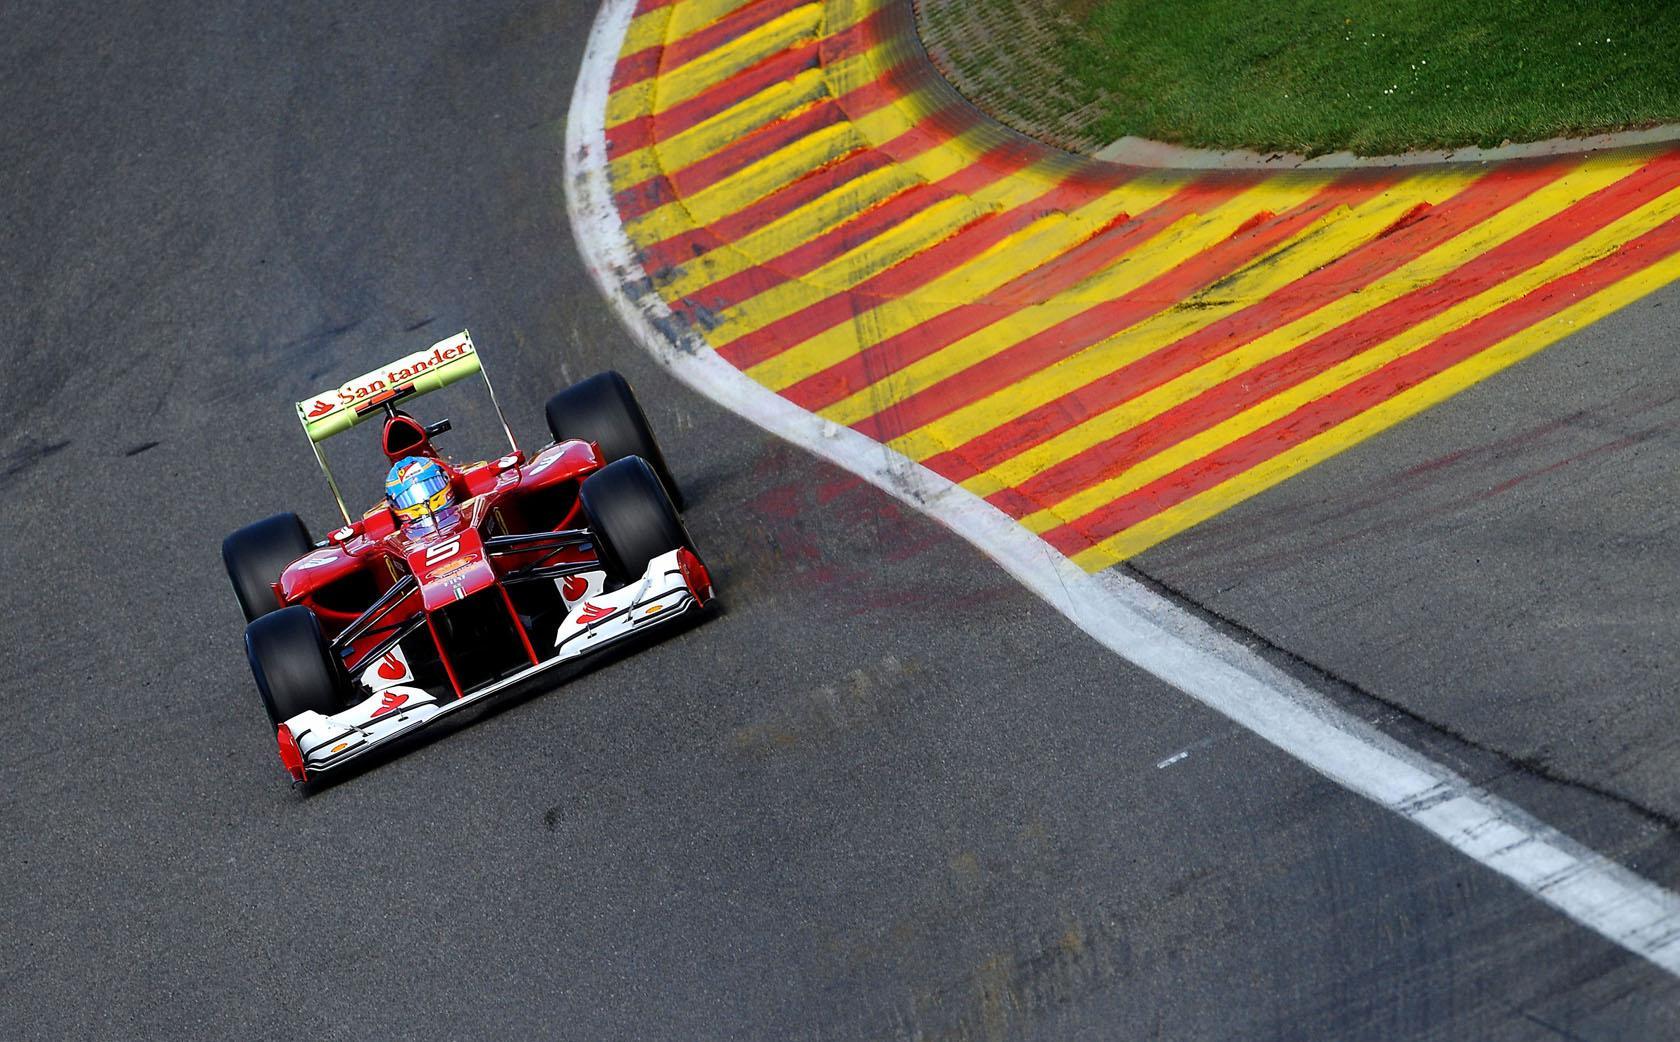 GP de Bélgica de F1. Button gana, Vettel segundo y Alonso abandona, así lo vivimos